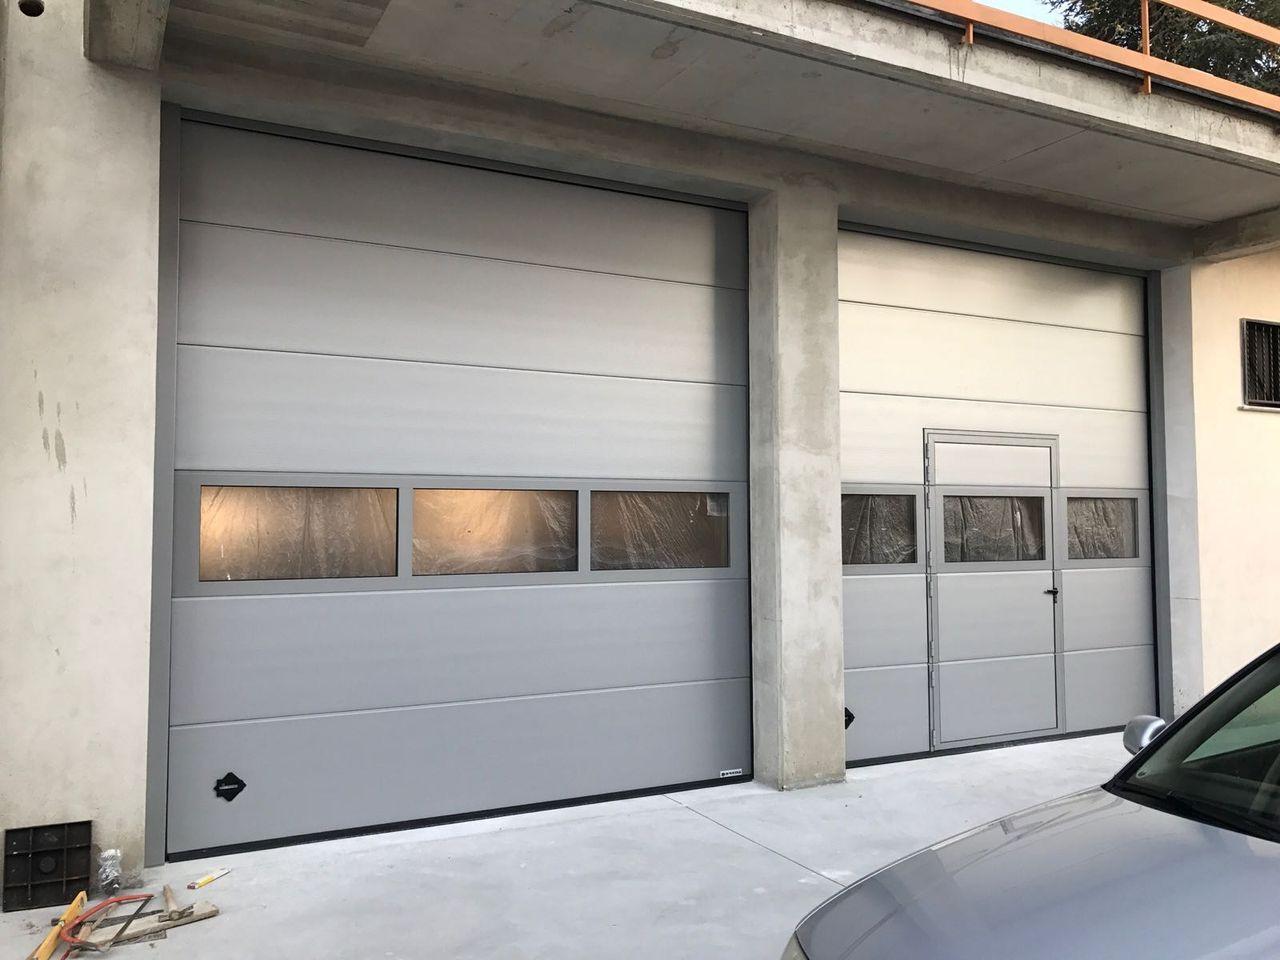 Porte sezionali industriali De Biasi Mantova, Modena, Reggio Emilia, Verona